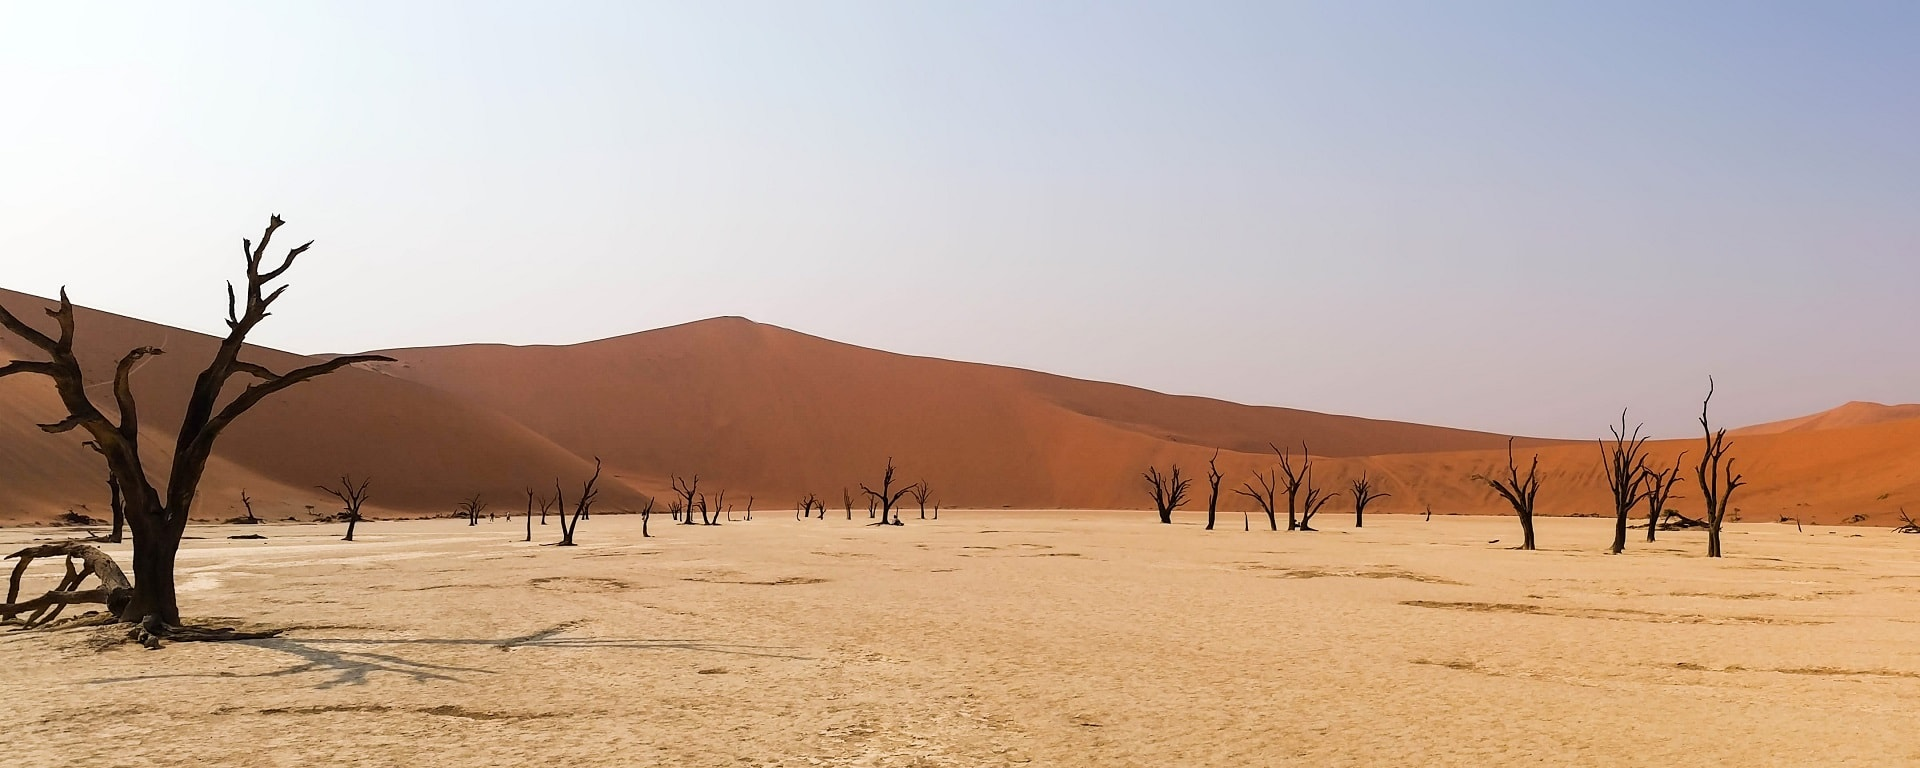 8_Namibie-Deadvlei-Header-min